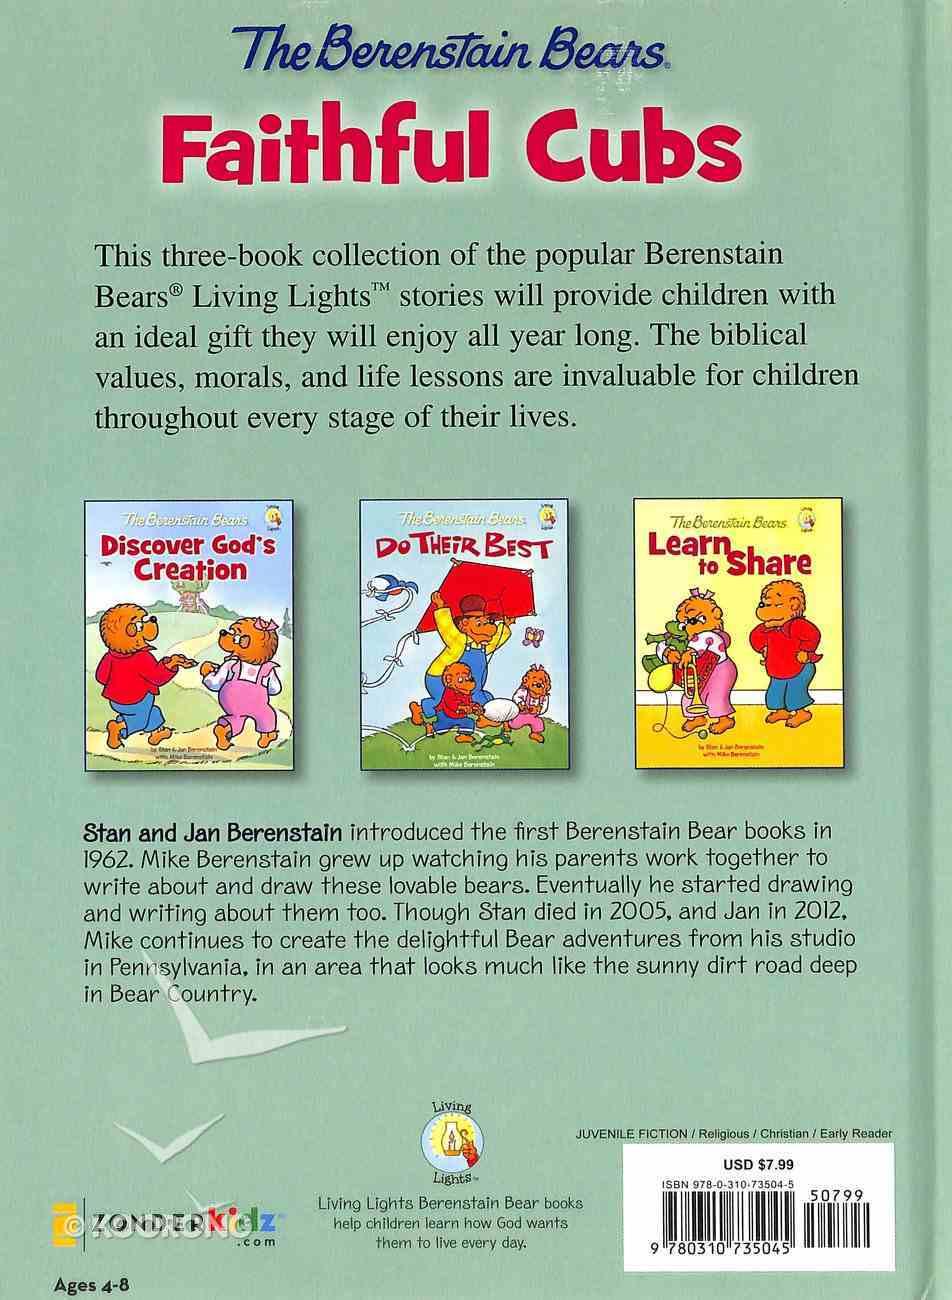 The Faithful Cubs (The Berenstain Bears Series) Hardback